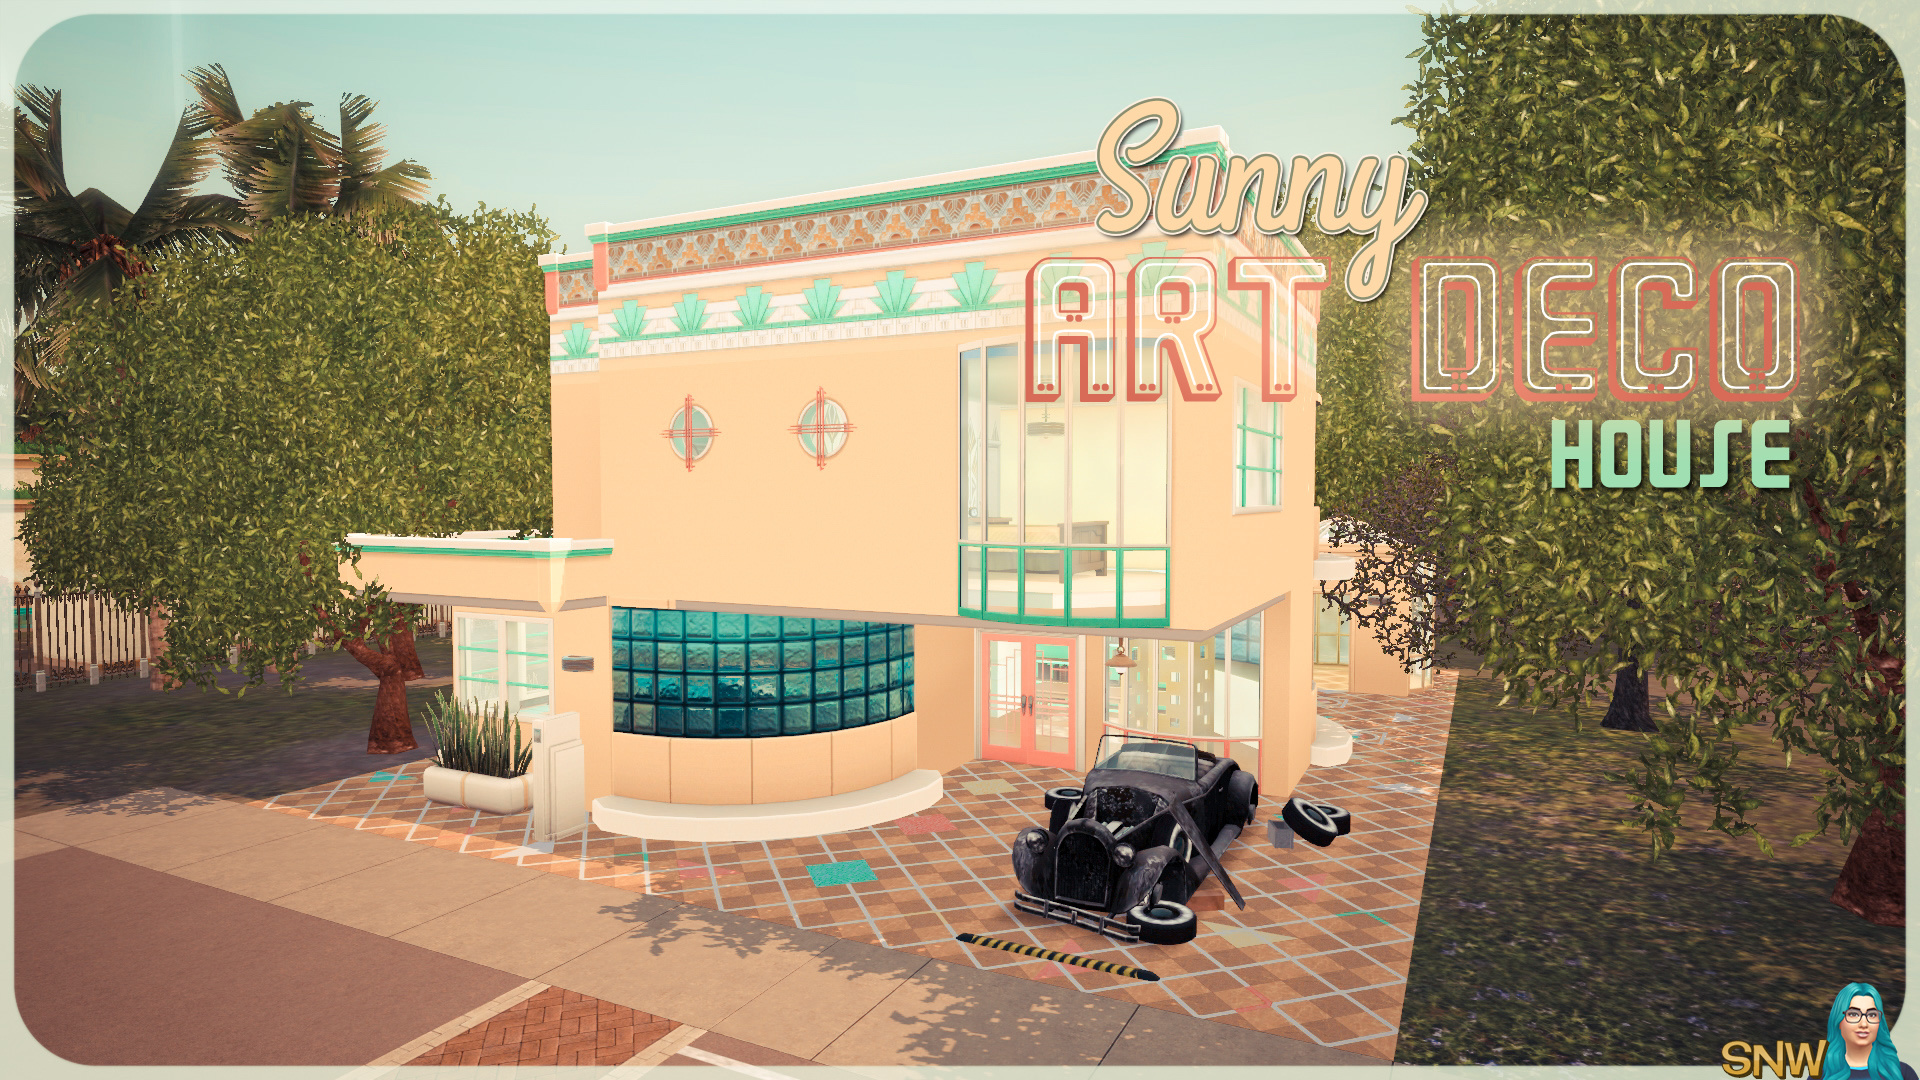 Sunny art deco house snw simsnetwork.com